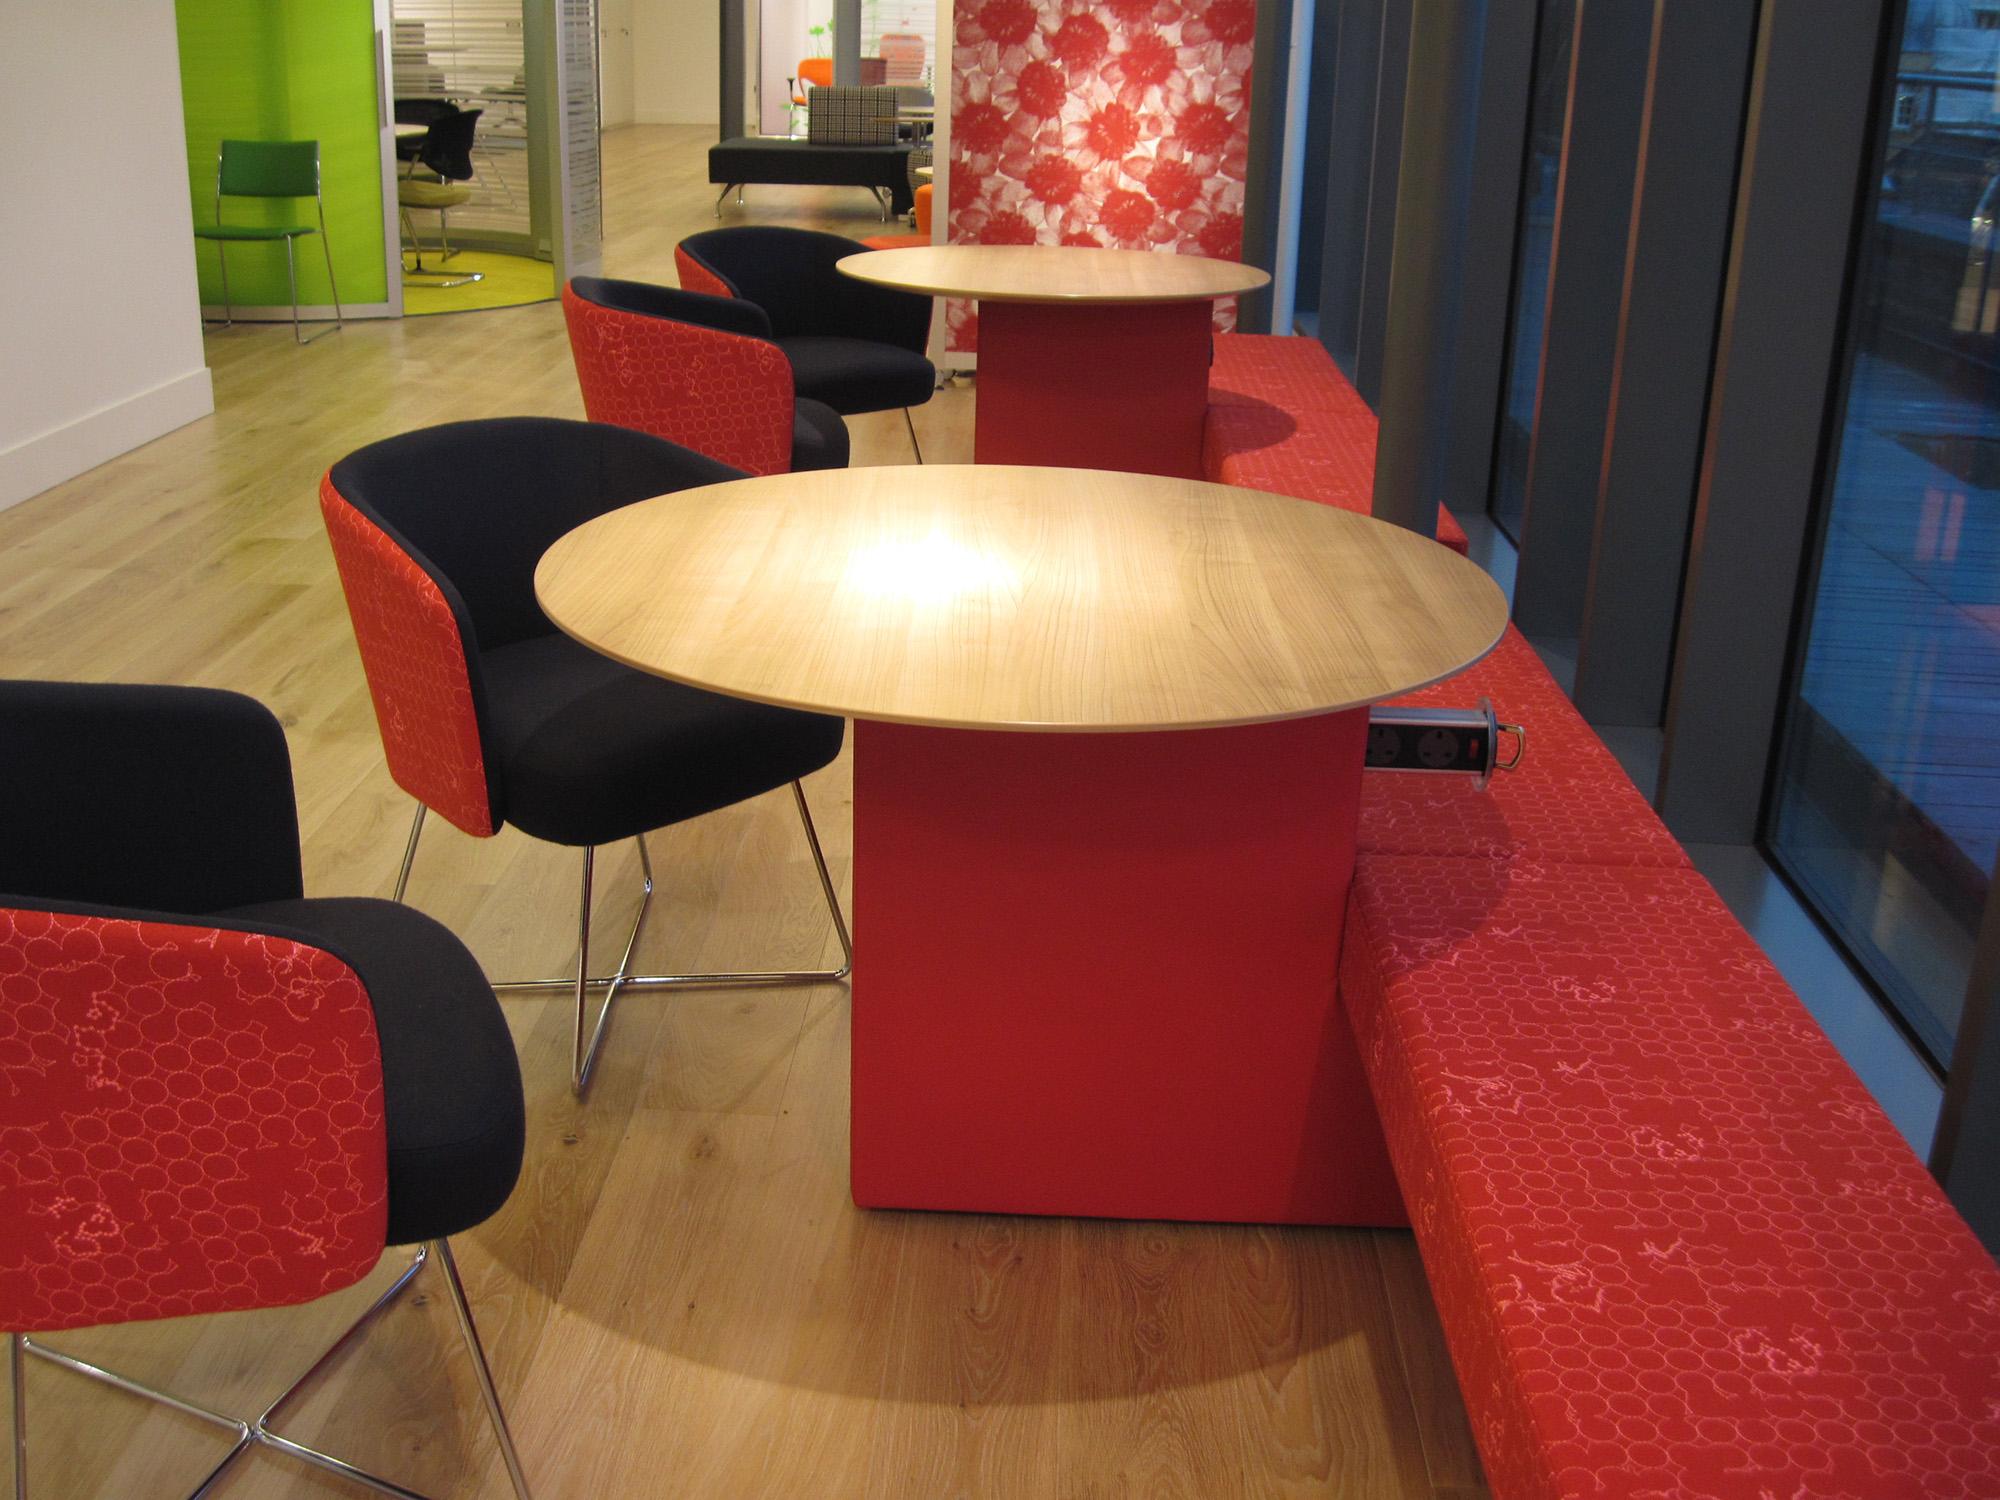 mobilier d attente mobilier wlc concept. Black Bedroom Furniture Sets. Home Design Ideas